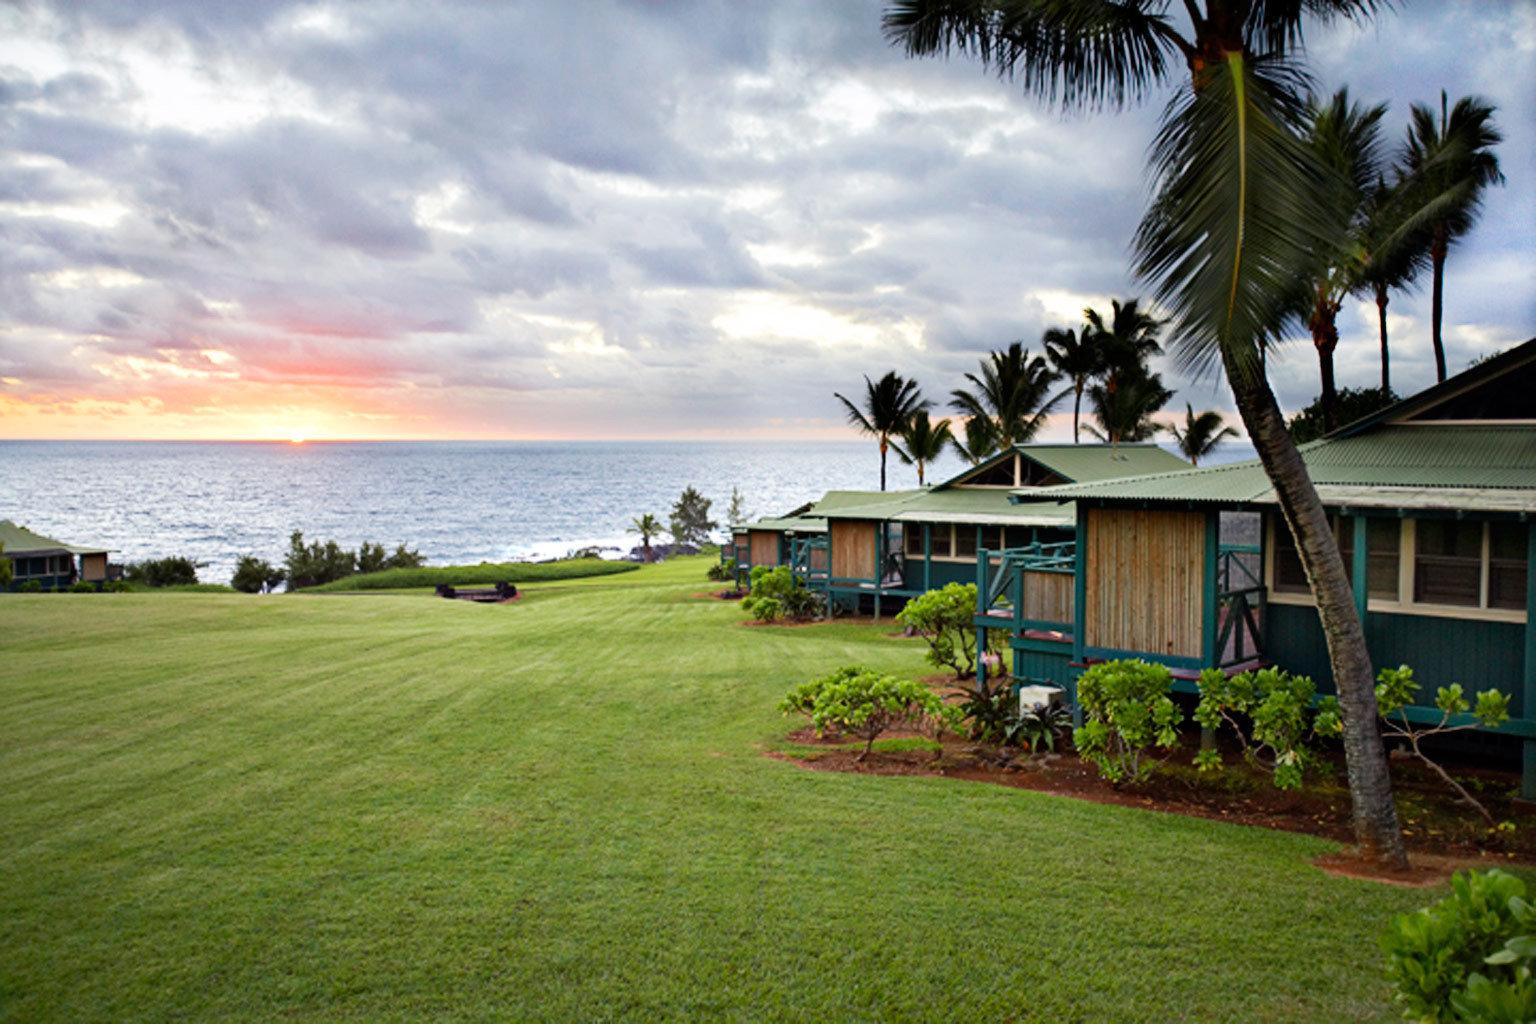 Exterior Grounds Rustic Sunset Waterfront grass sky plant tree Beach Ocean green arecales Resort Coast Sea caribbean tropics palm lush